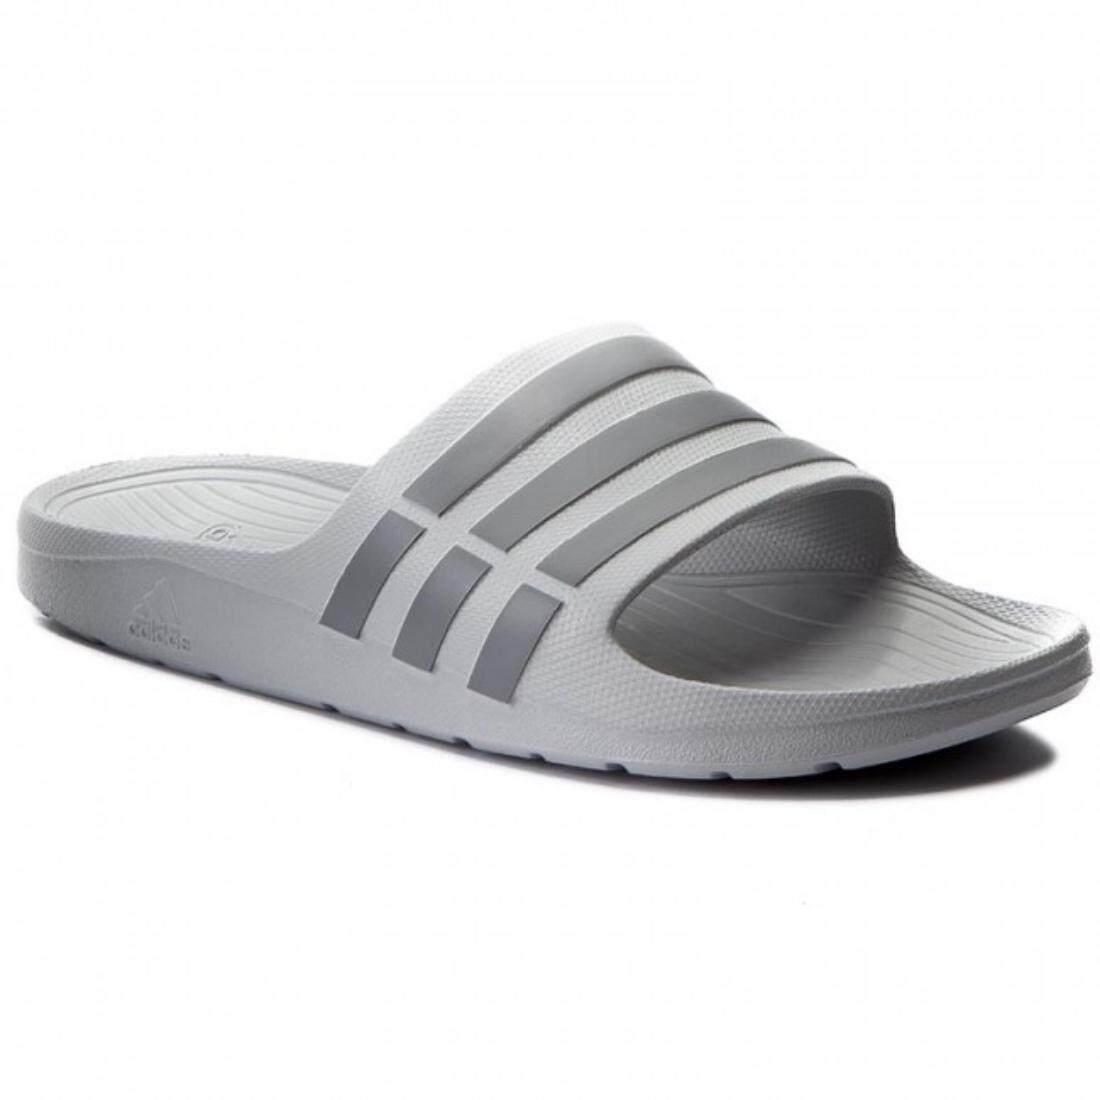 ed12c7bddca7 100% Original Adidas Adilette Duramo Slide Bath Shoes Flip Flops for Men